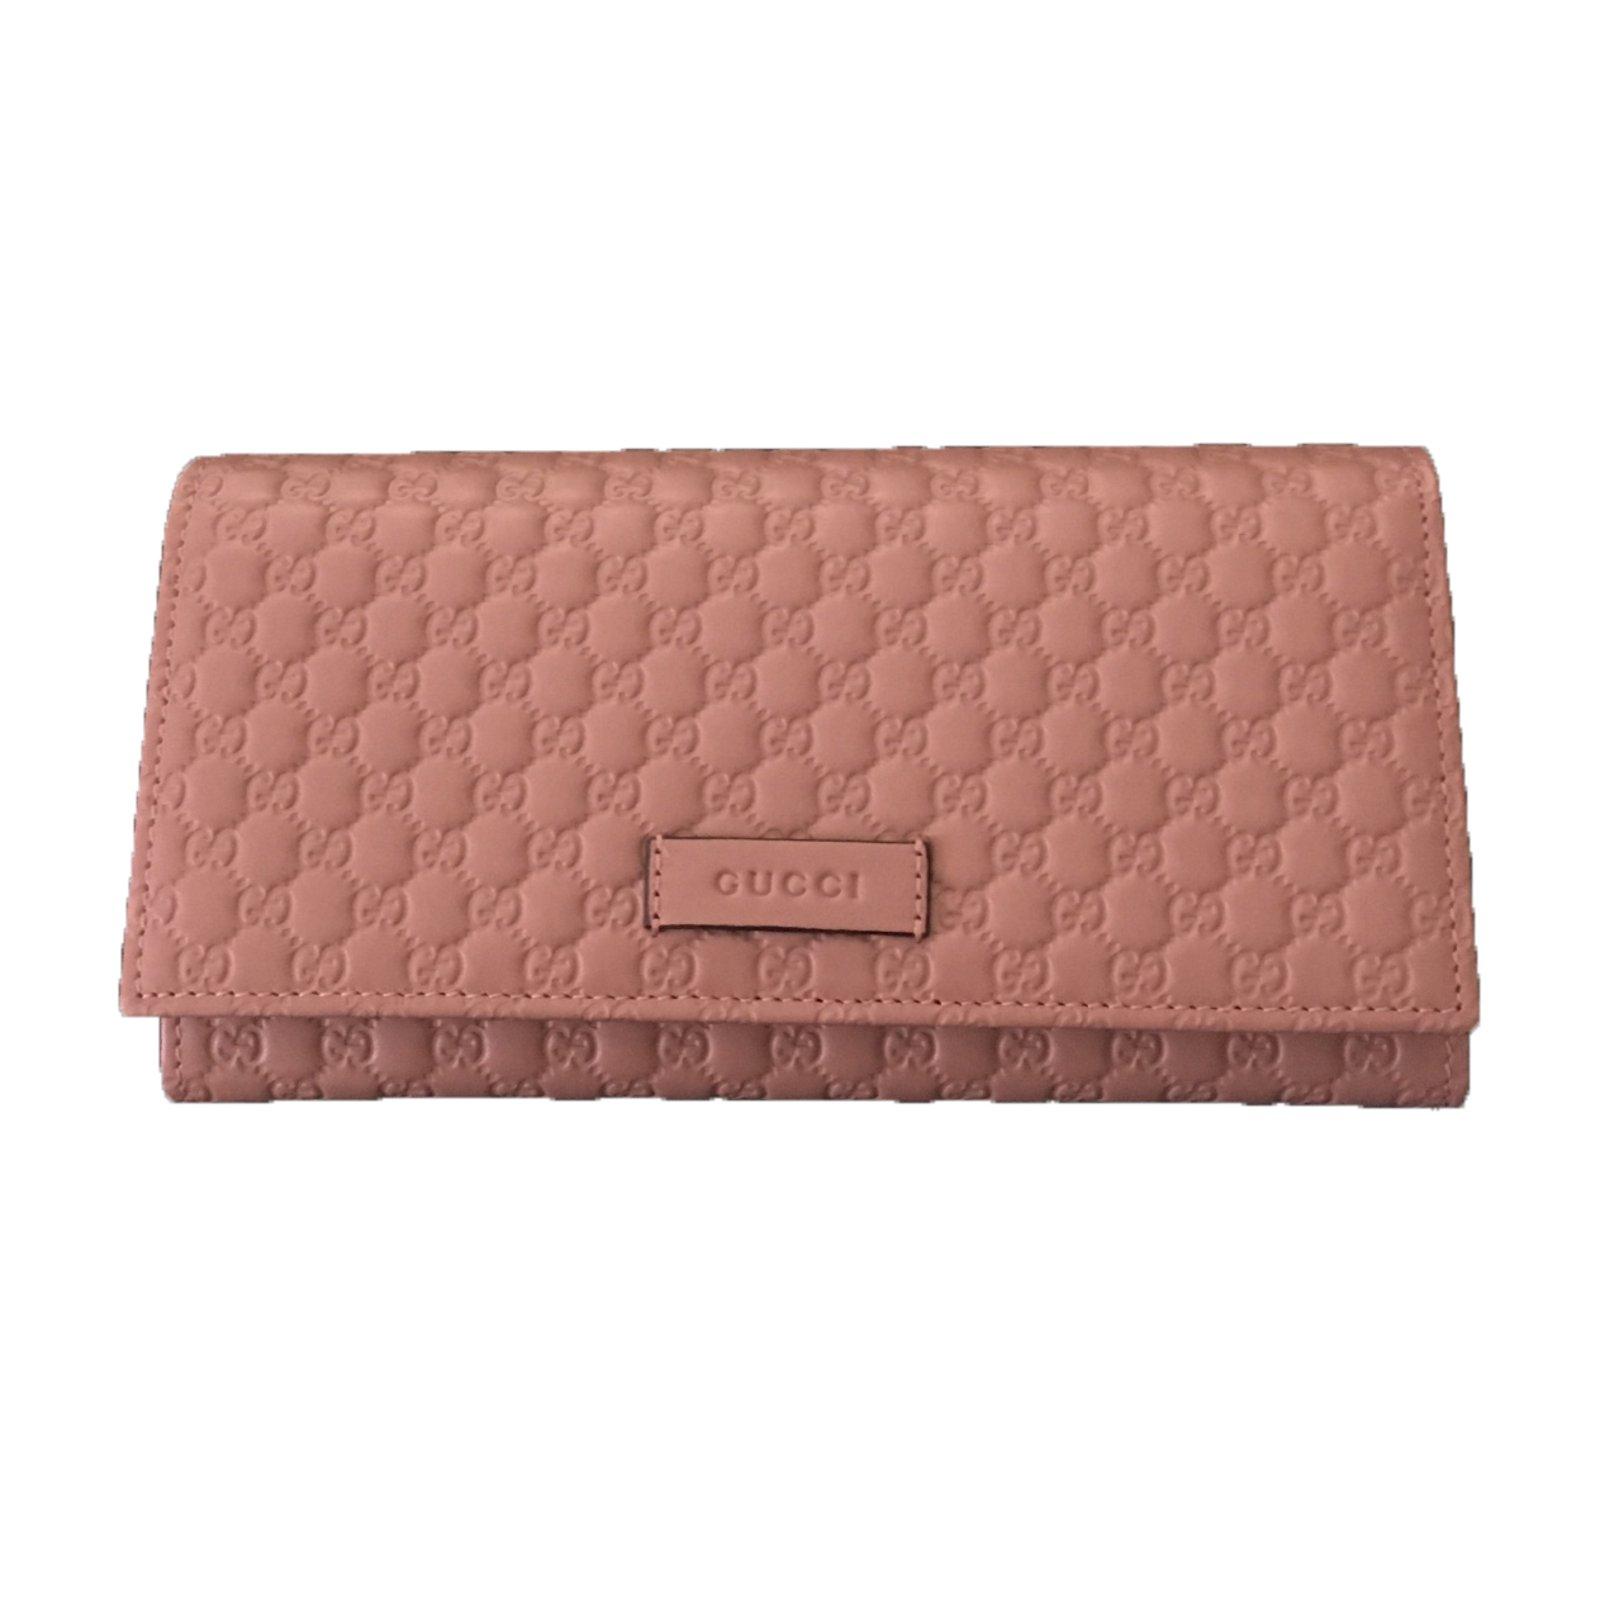 9c5af02cd301 Gucci Microguccissima purse Wallets Leather Pink ref.29981 - Joli Closet